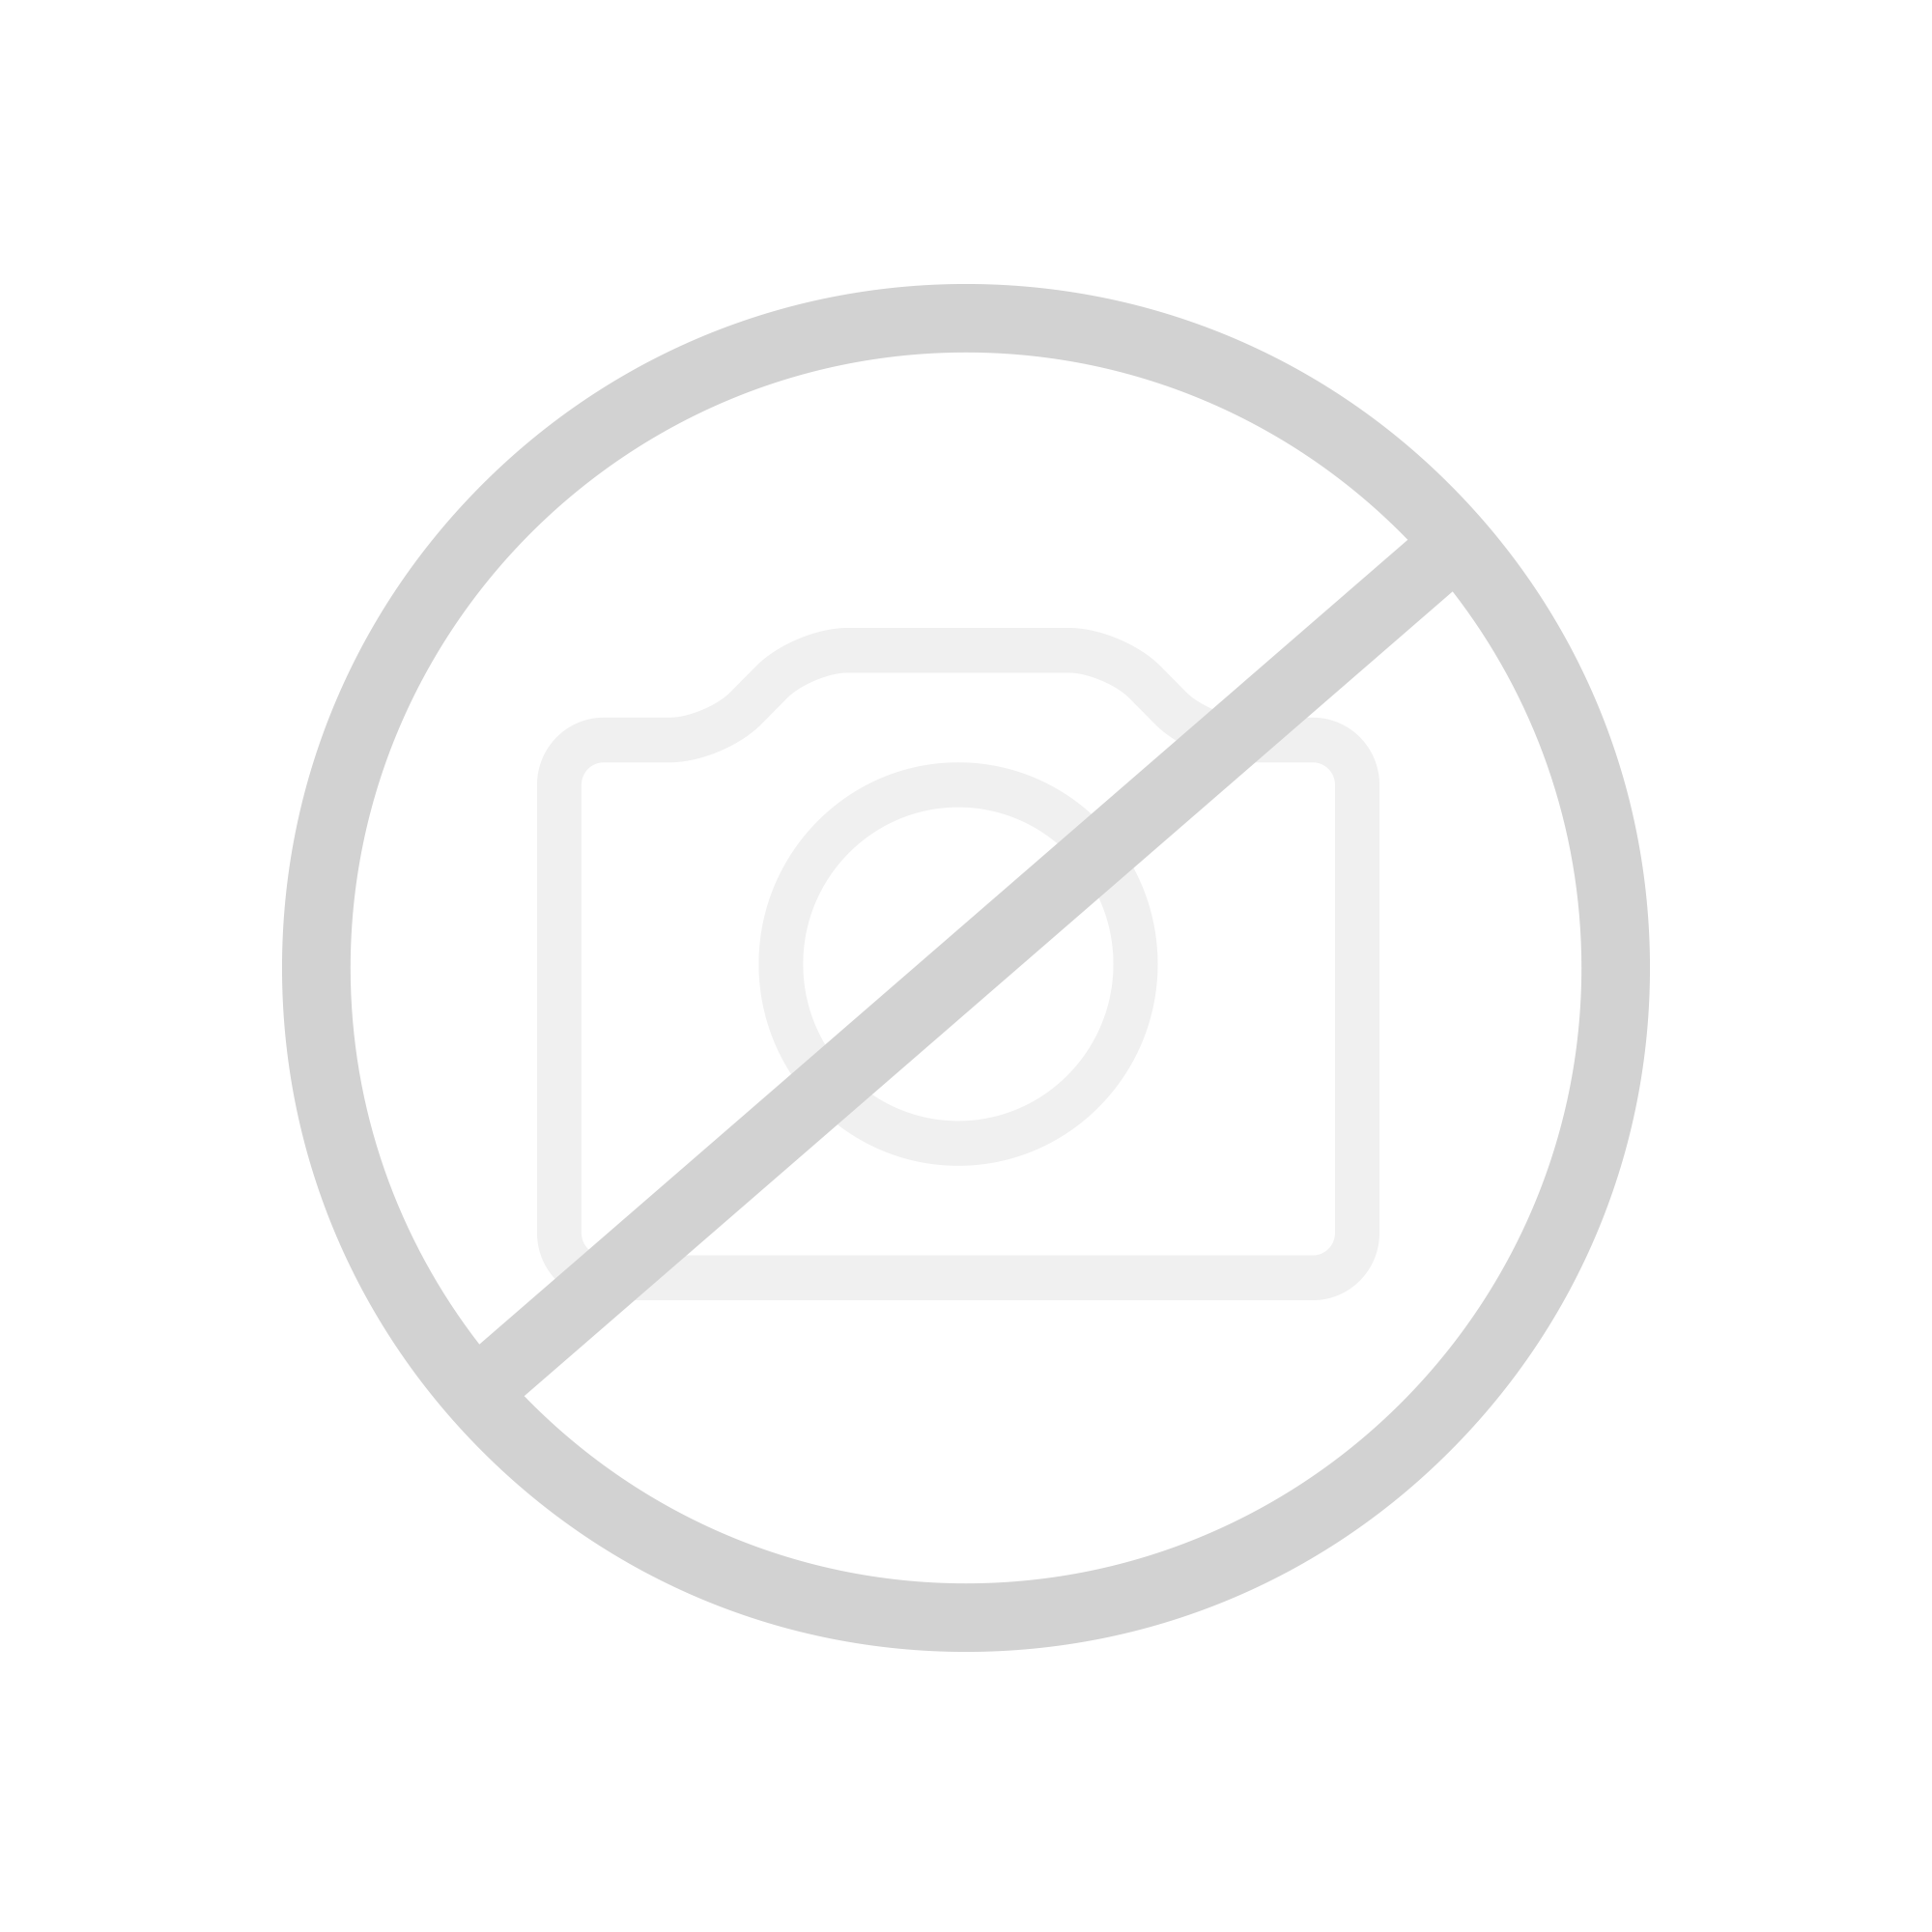 Relativ Villeroy & Boch More to See 14 LED Spiegel - A4291200 | REUTER FH44